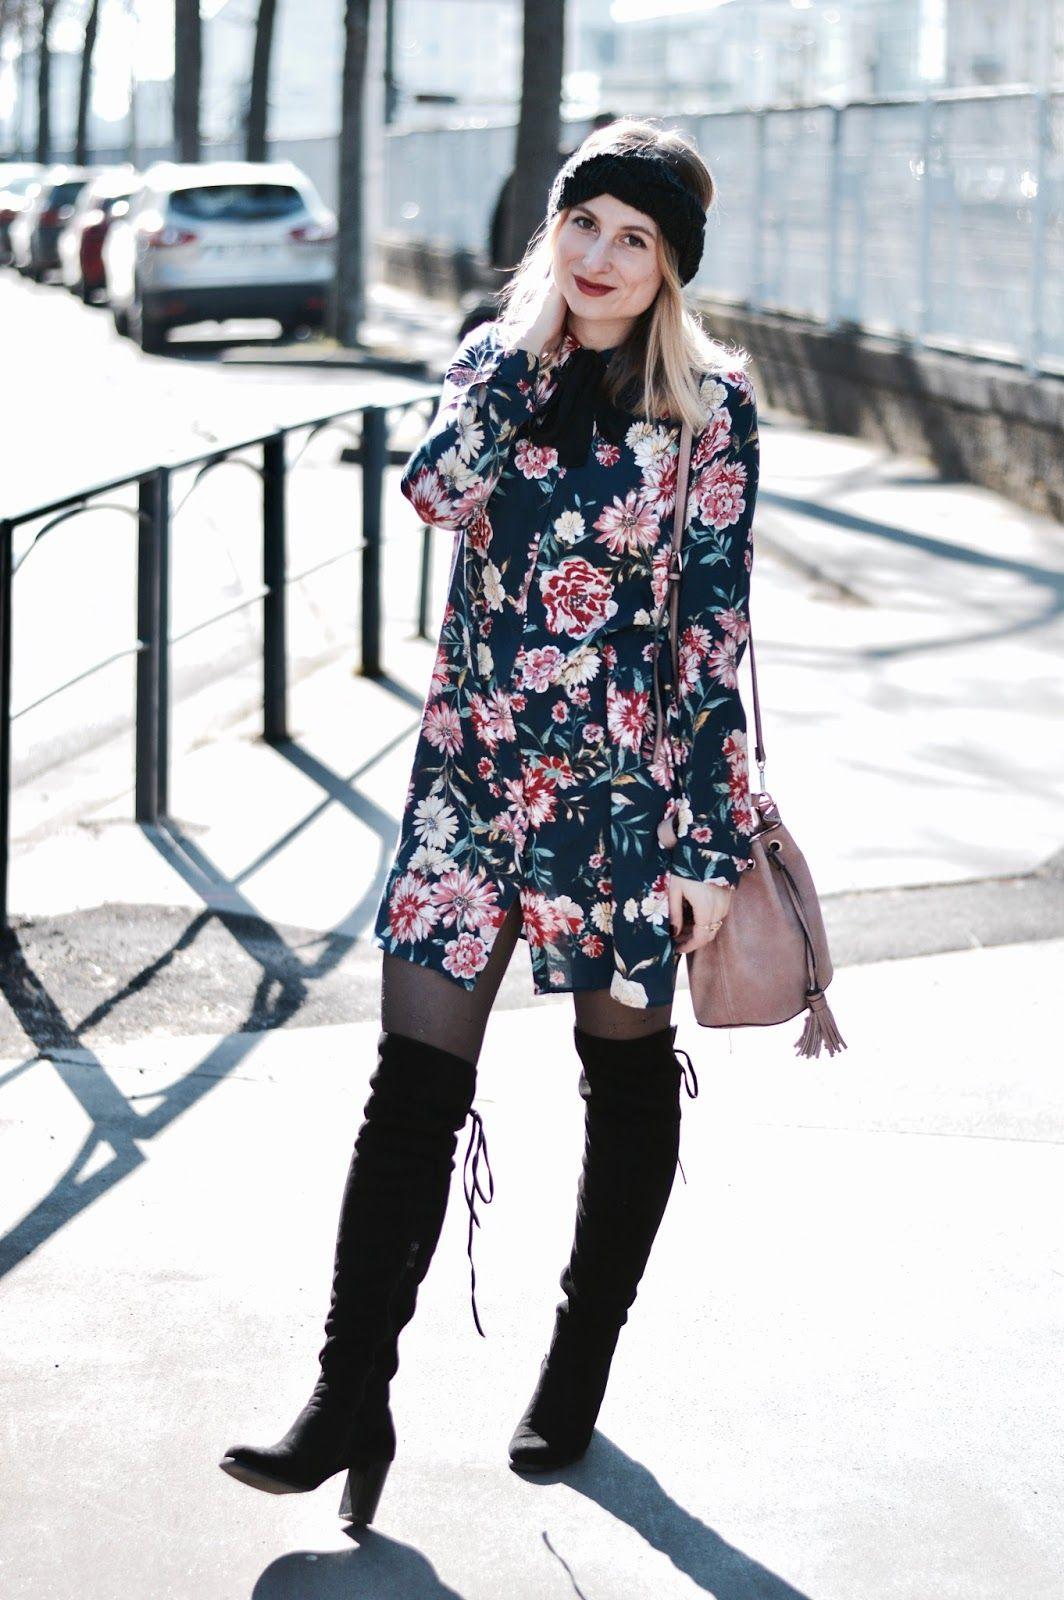 c37bb55049b Look femme   robe chemise fleurie Pimkie et cuissardes